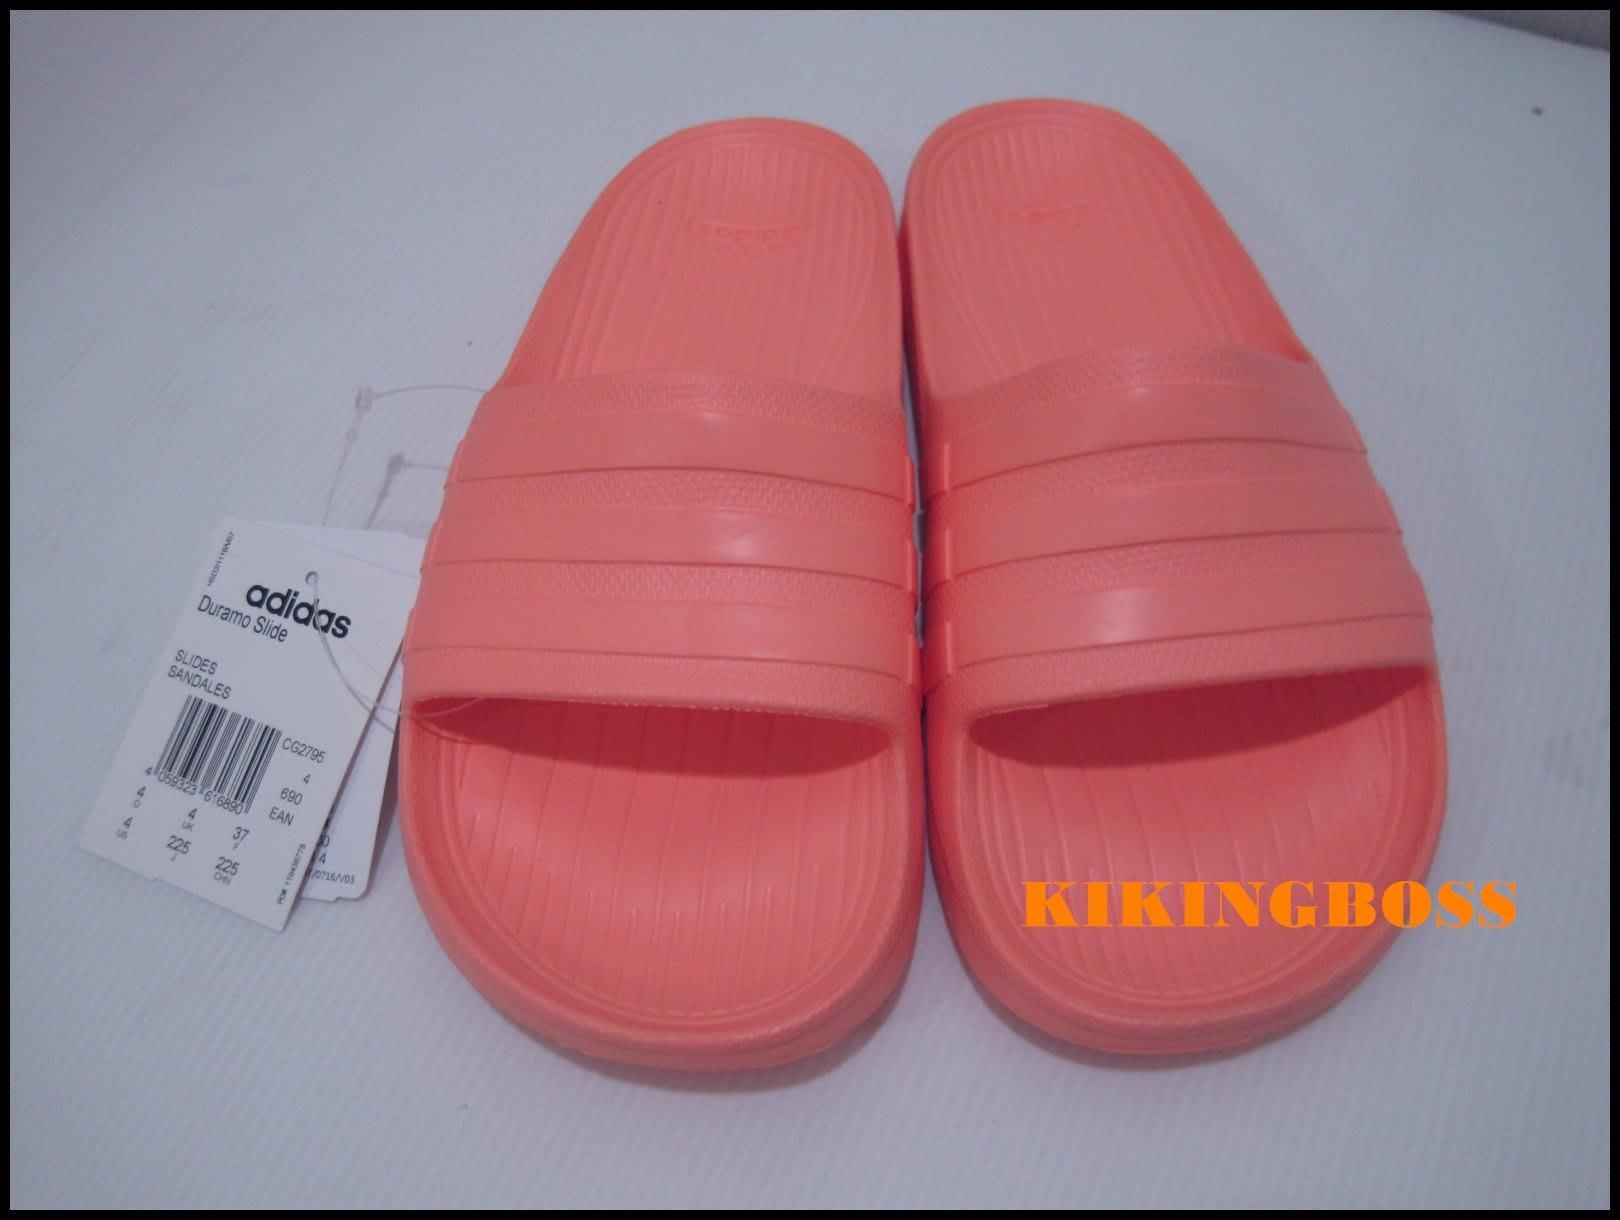 f9f893734c5b80 喬治城 ADIDAS DURAMO SLIDE 運動拖鞋女款粉橘色CG2795 特價590元 ...